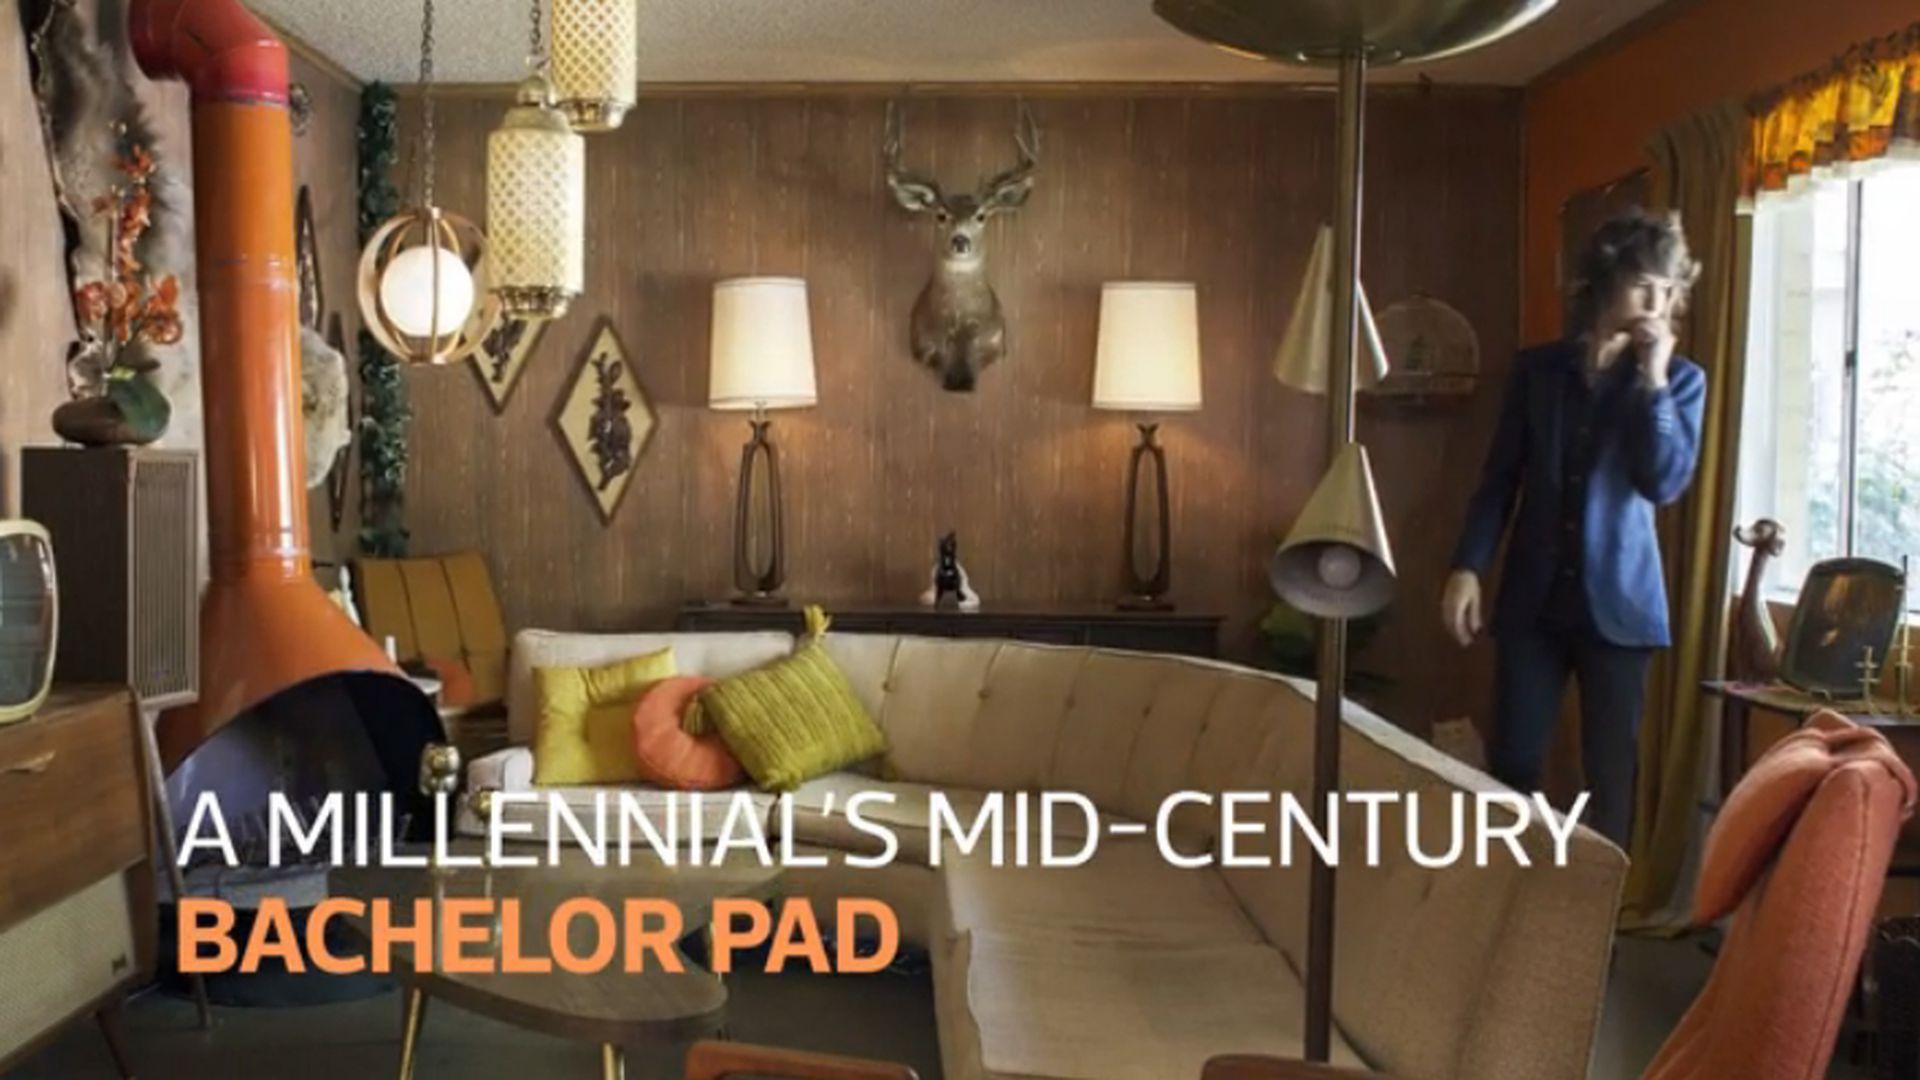 A Millennial Creates Time Capsule Bachelor Pad